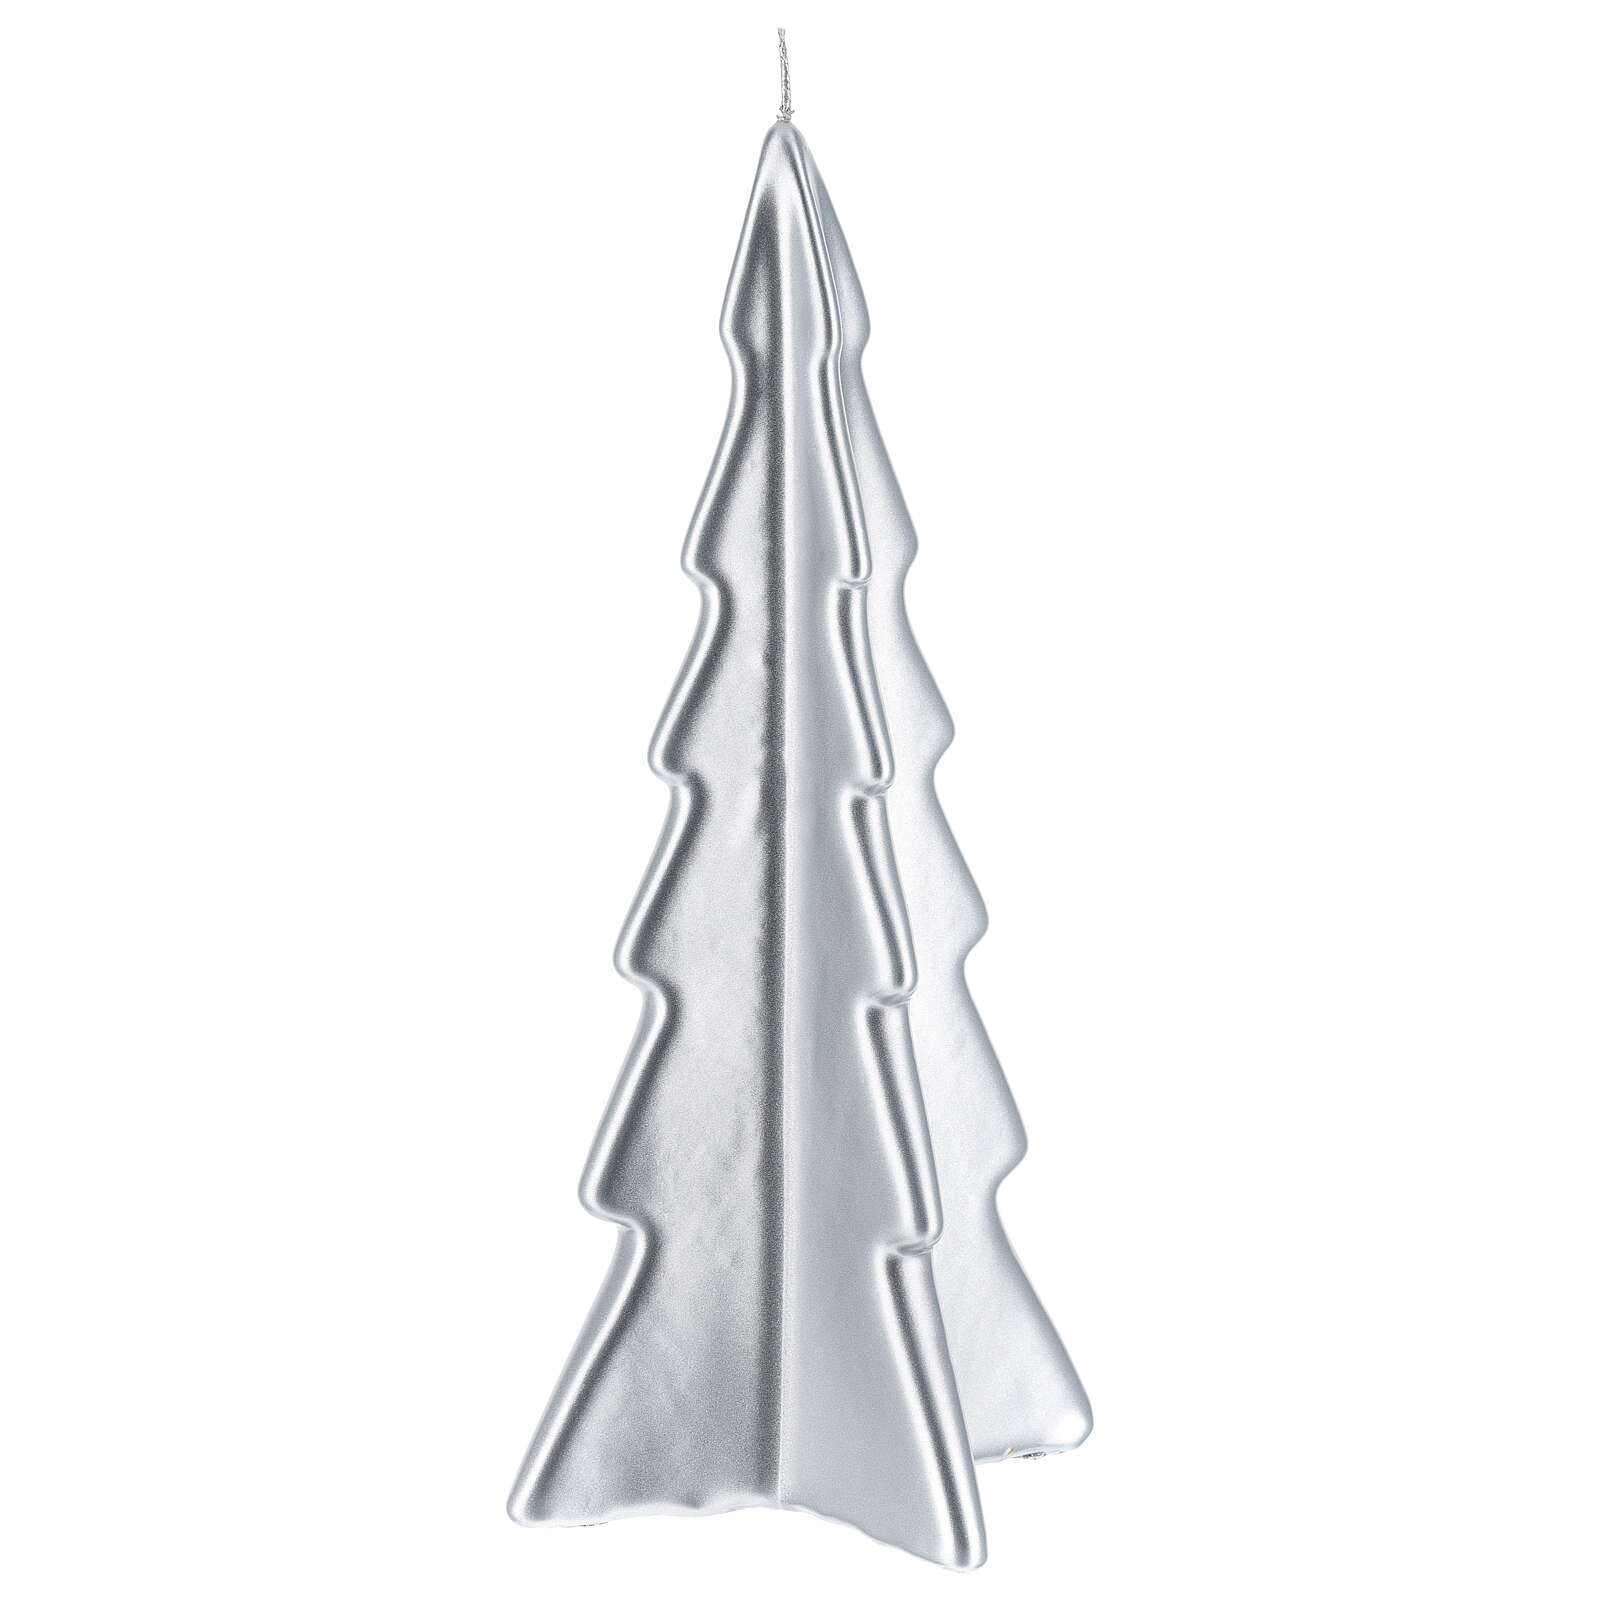 Vela de Natal árvore prateada modelo Oslo 26 cm 3